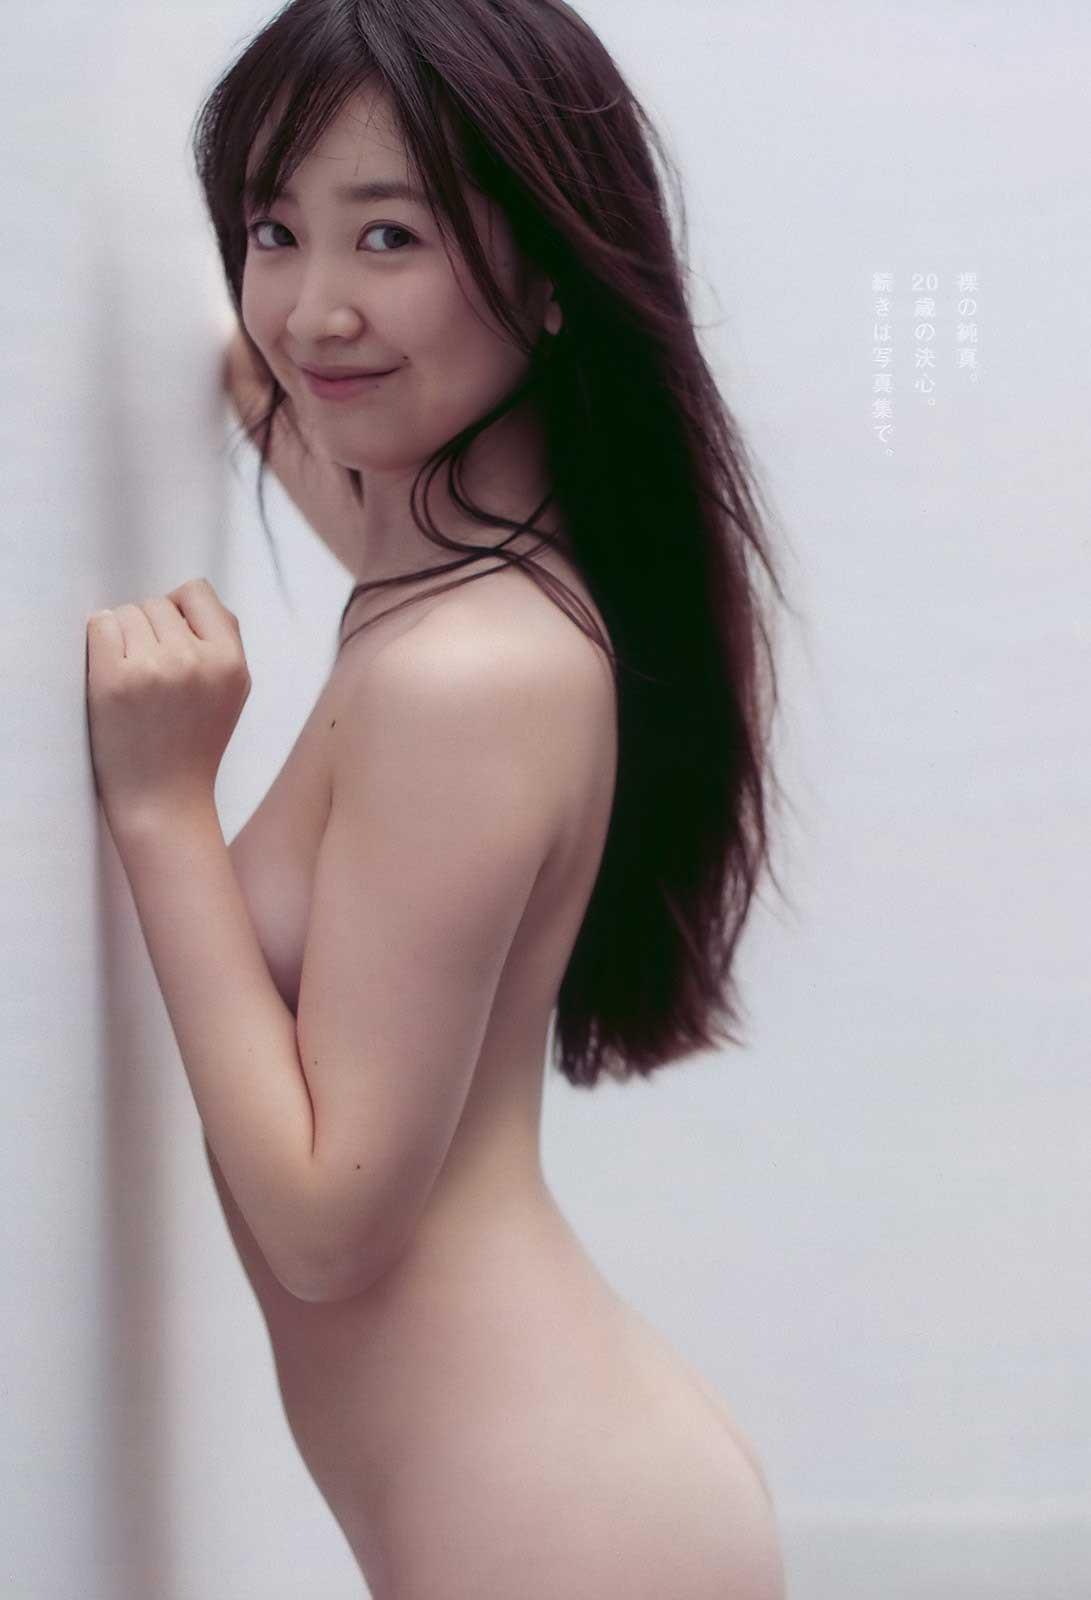 黒川智子 ヌード画像 80